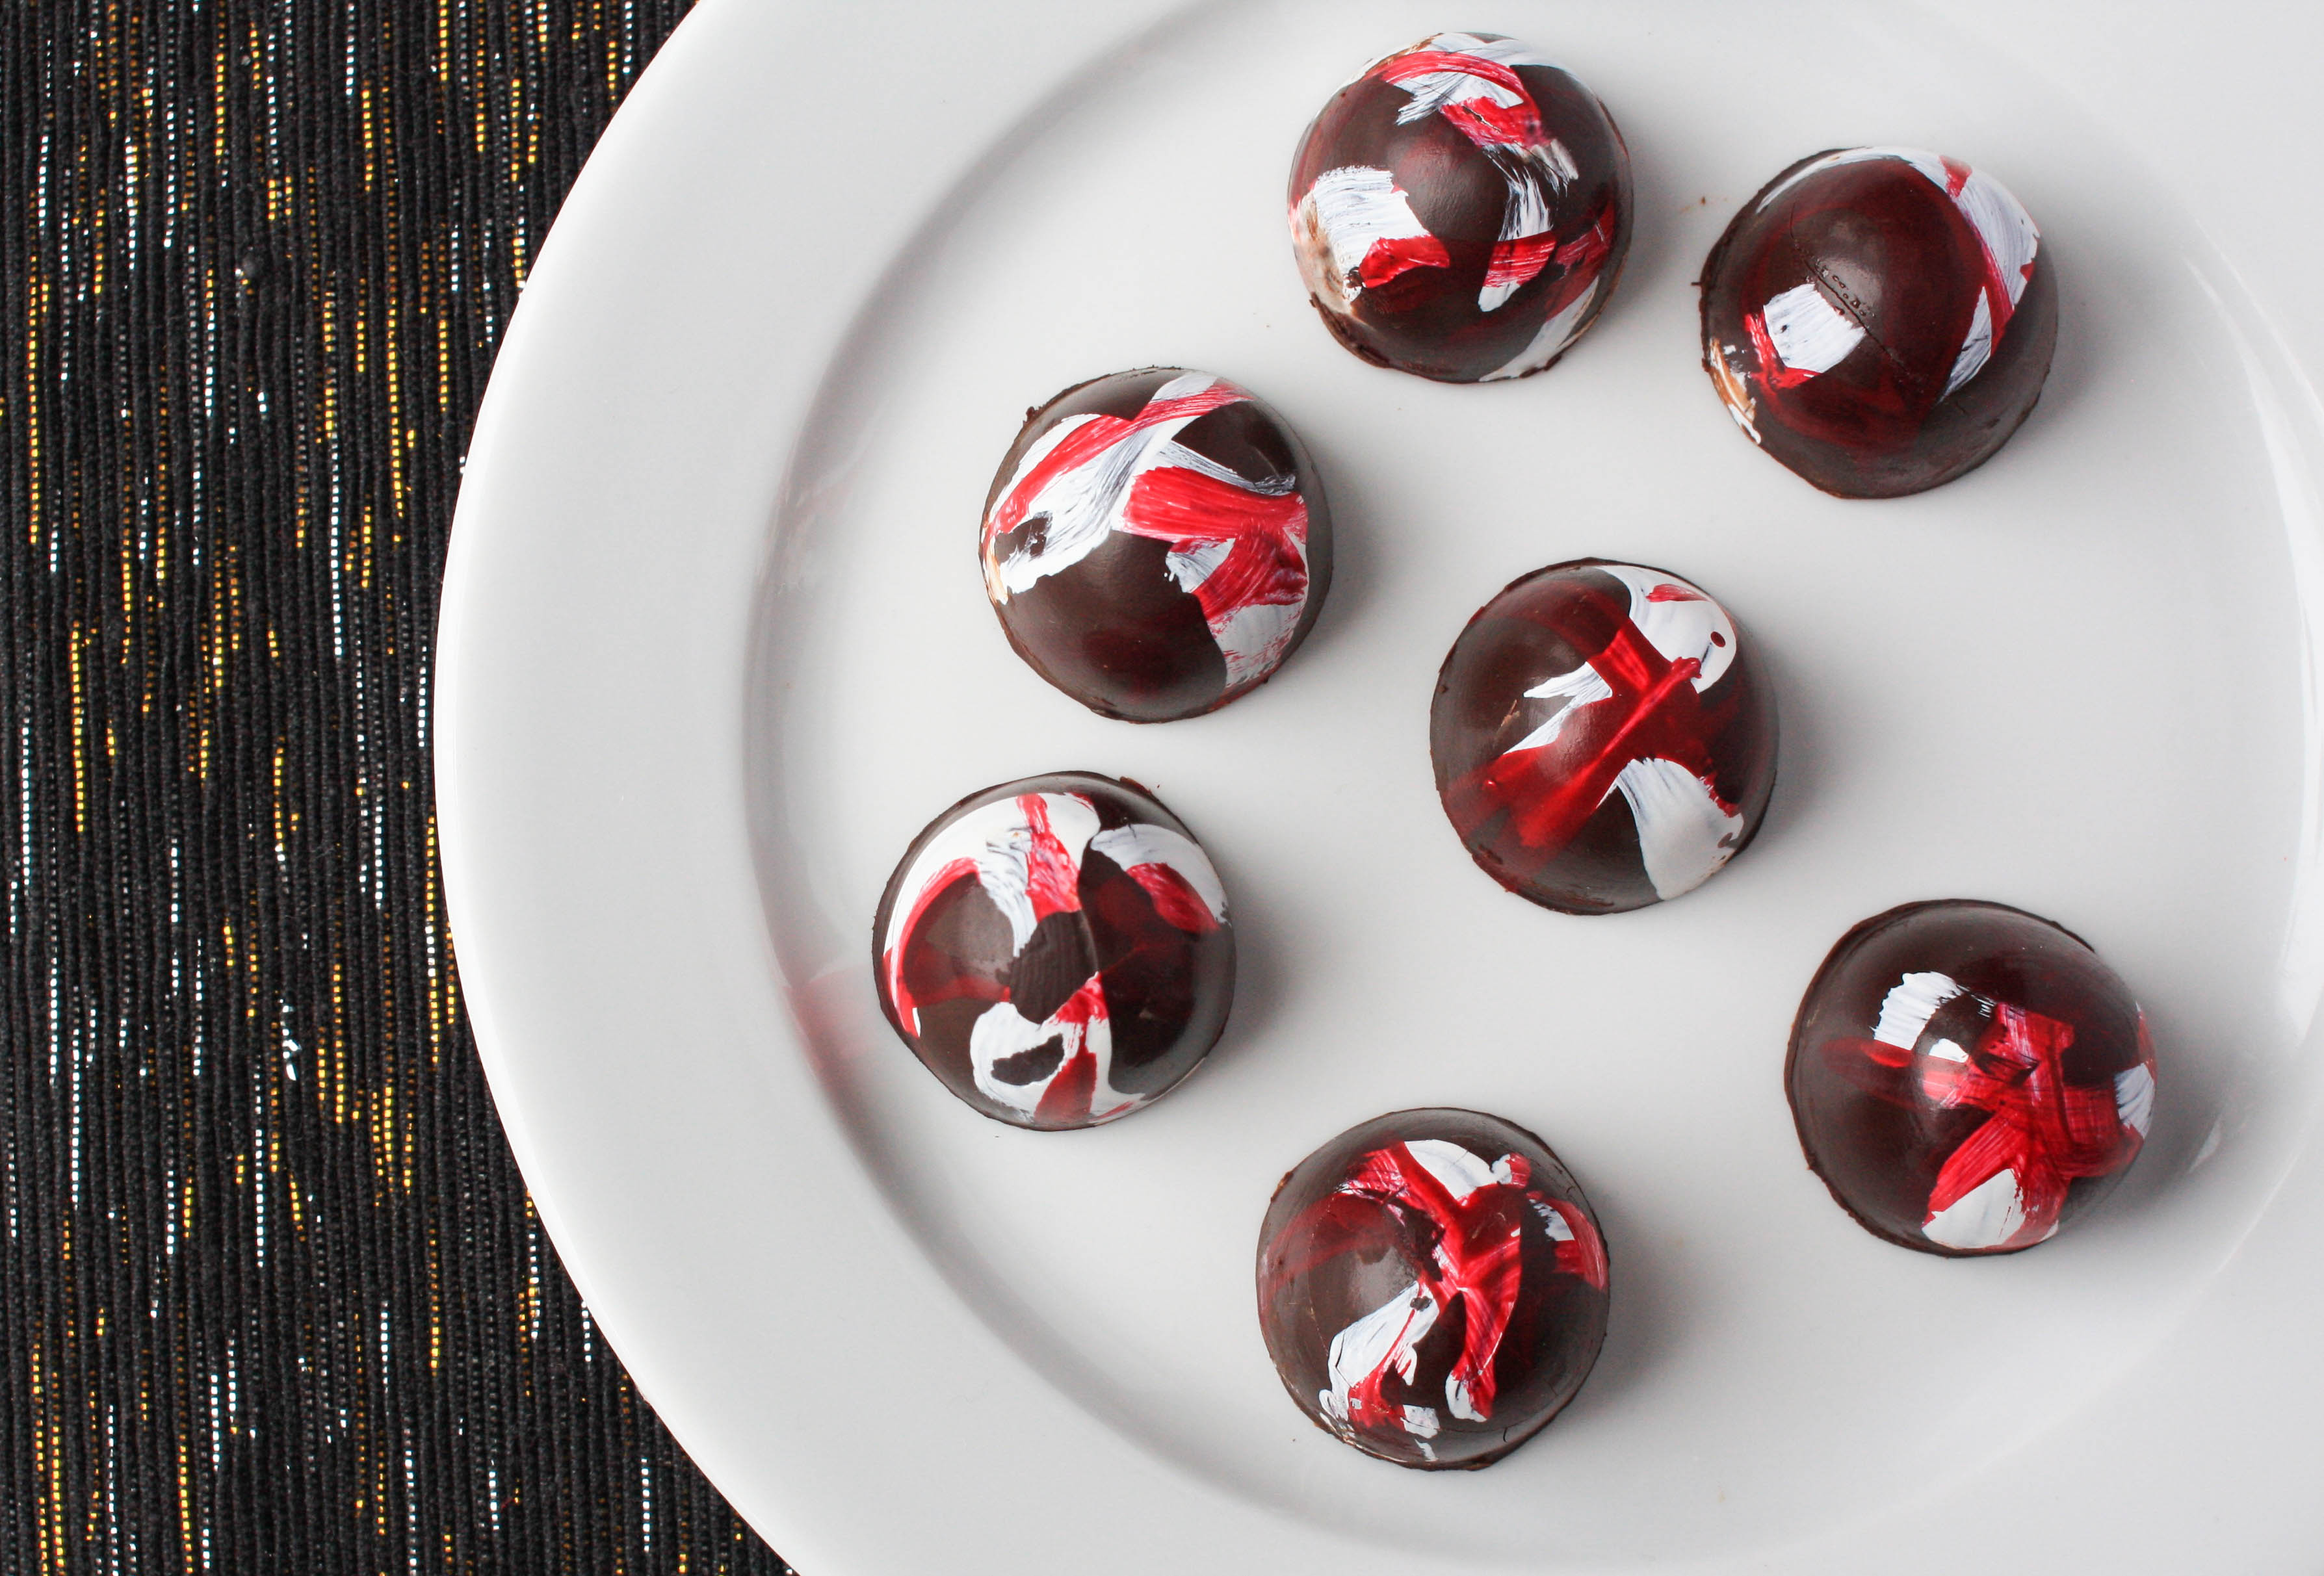 How to Make Molded Chocolates | Erin Gardner